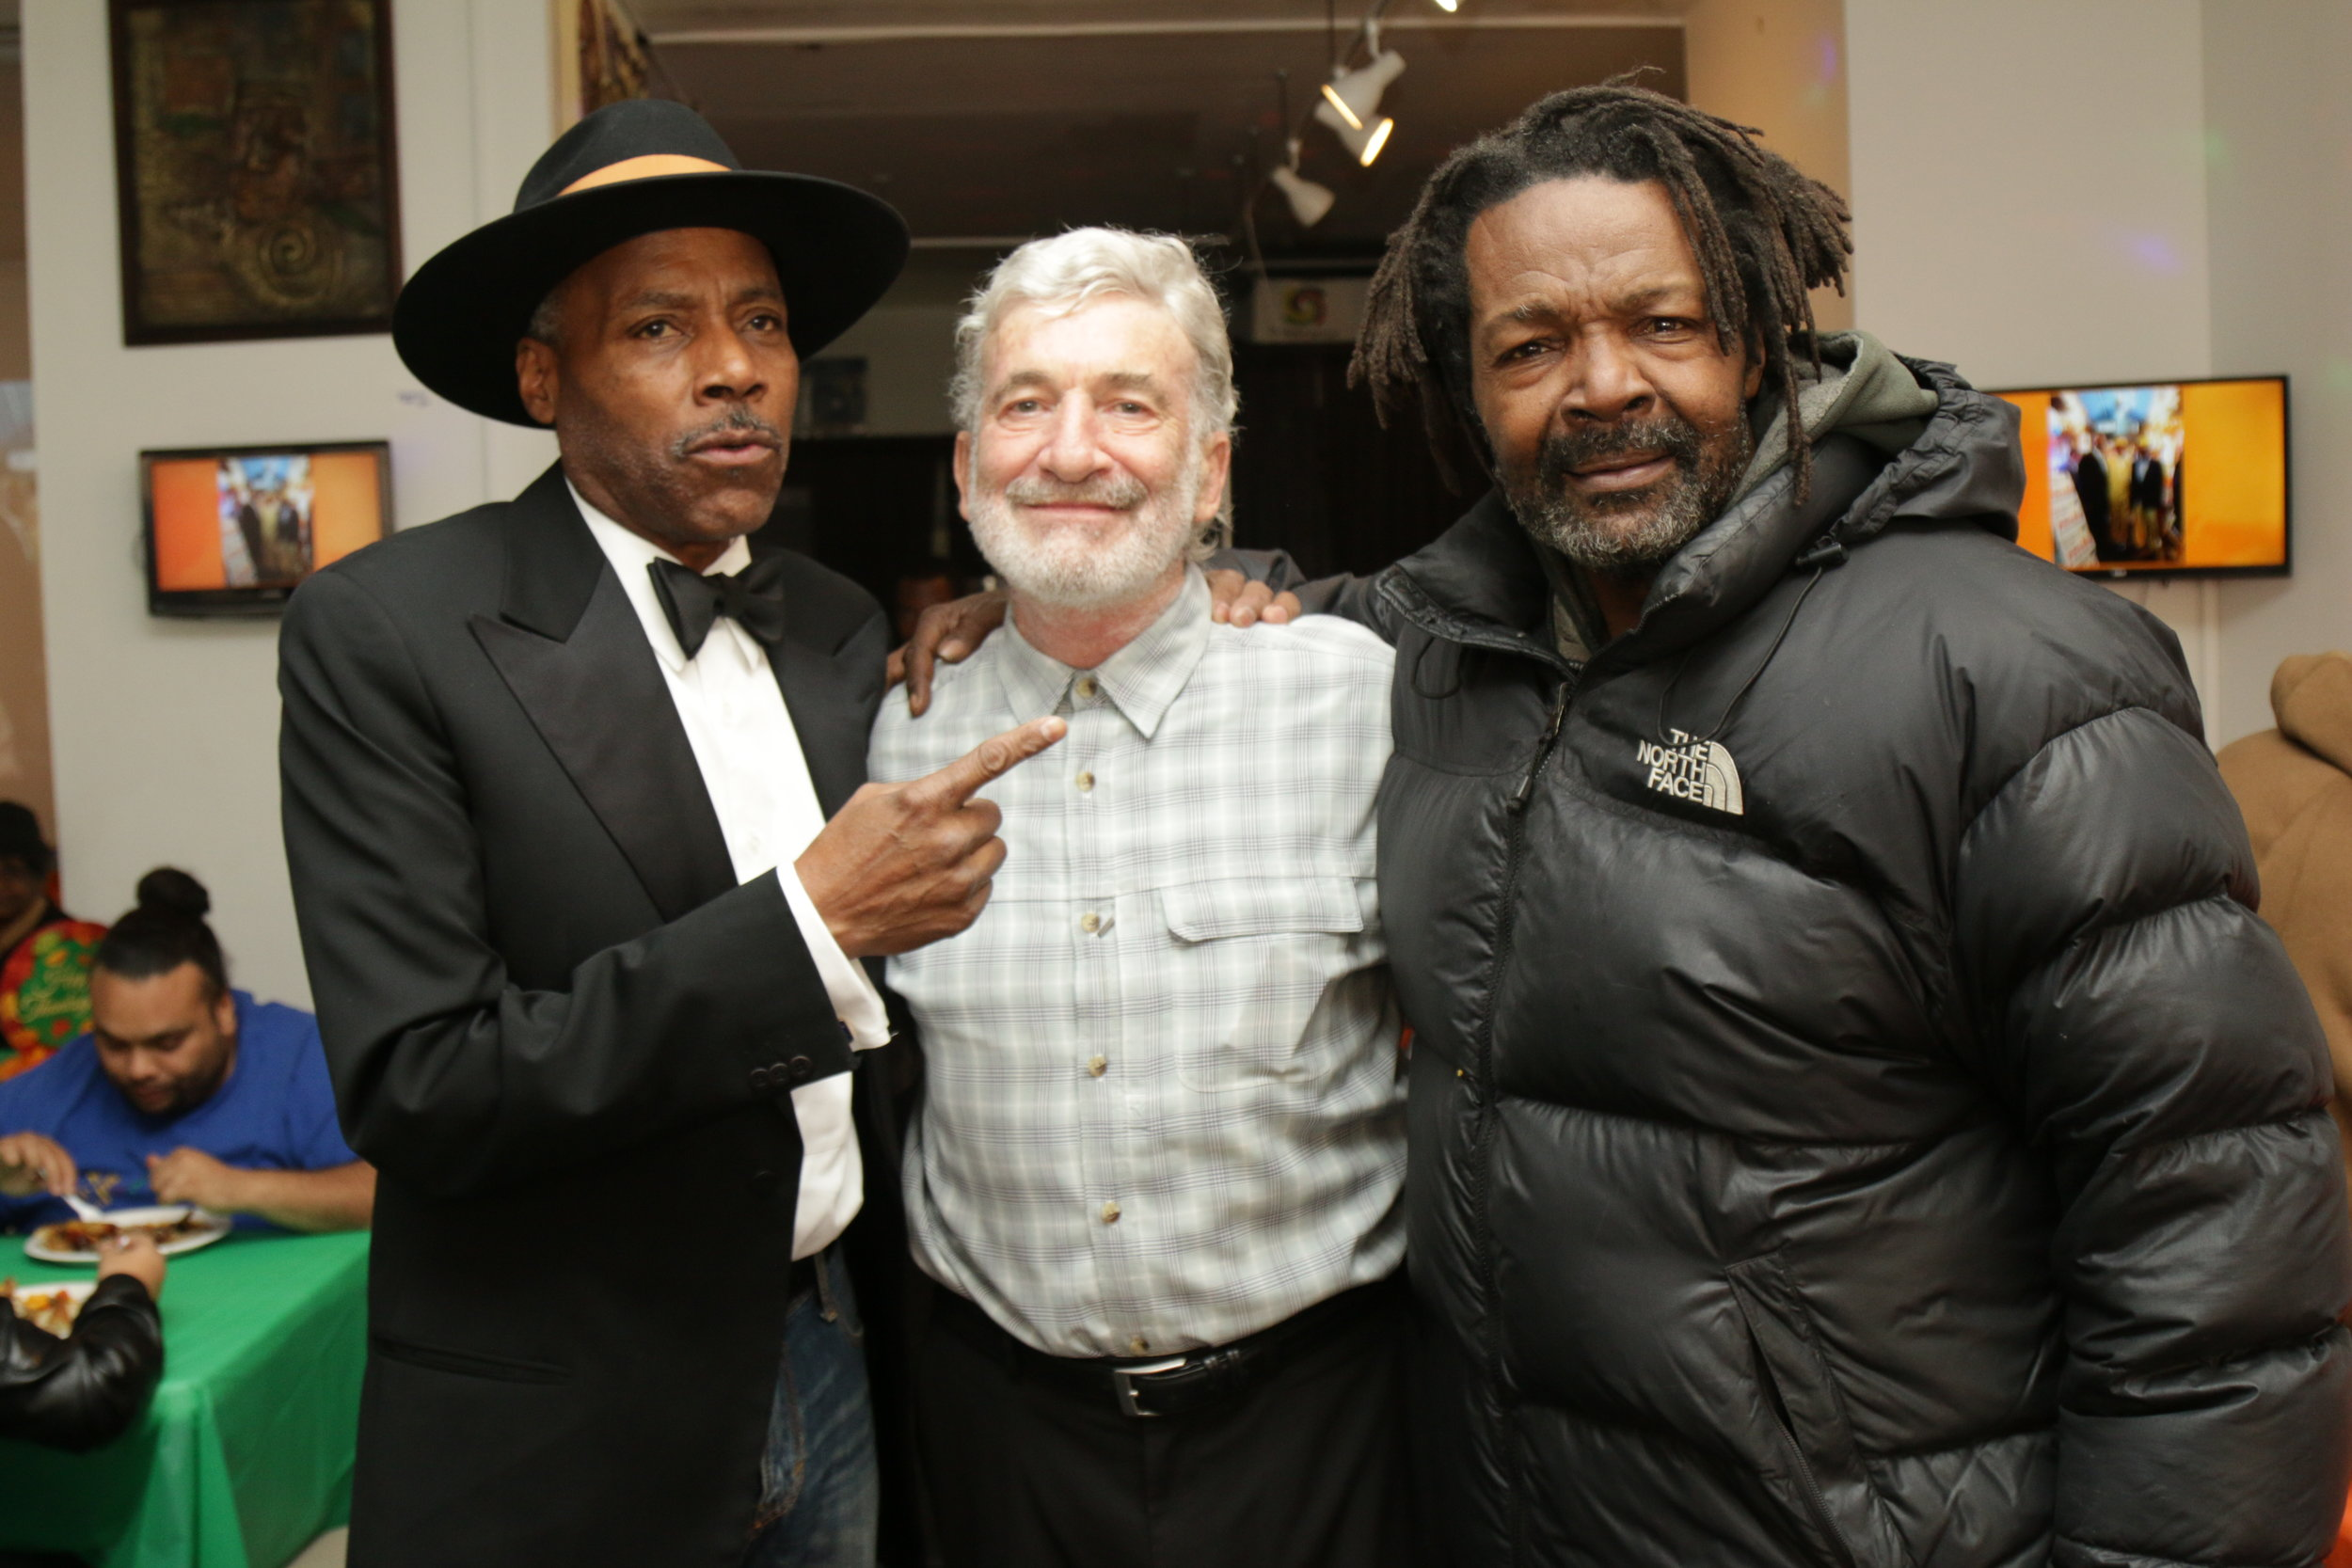 City Councilman Bill Perkins, Jerry Migdol and friend.JPG